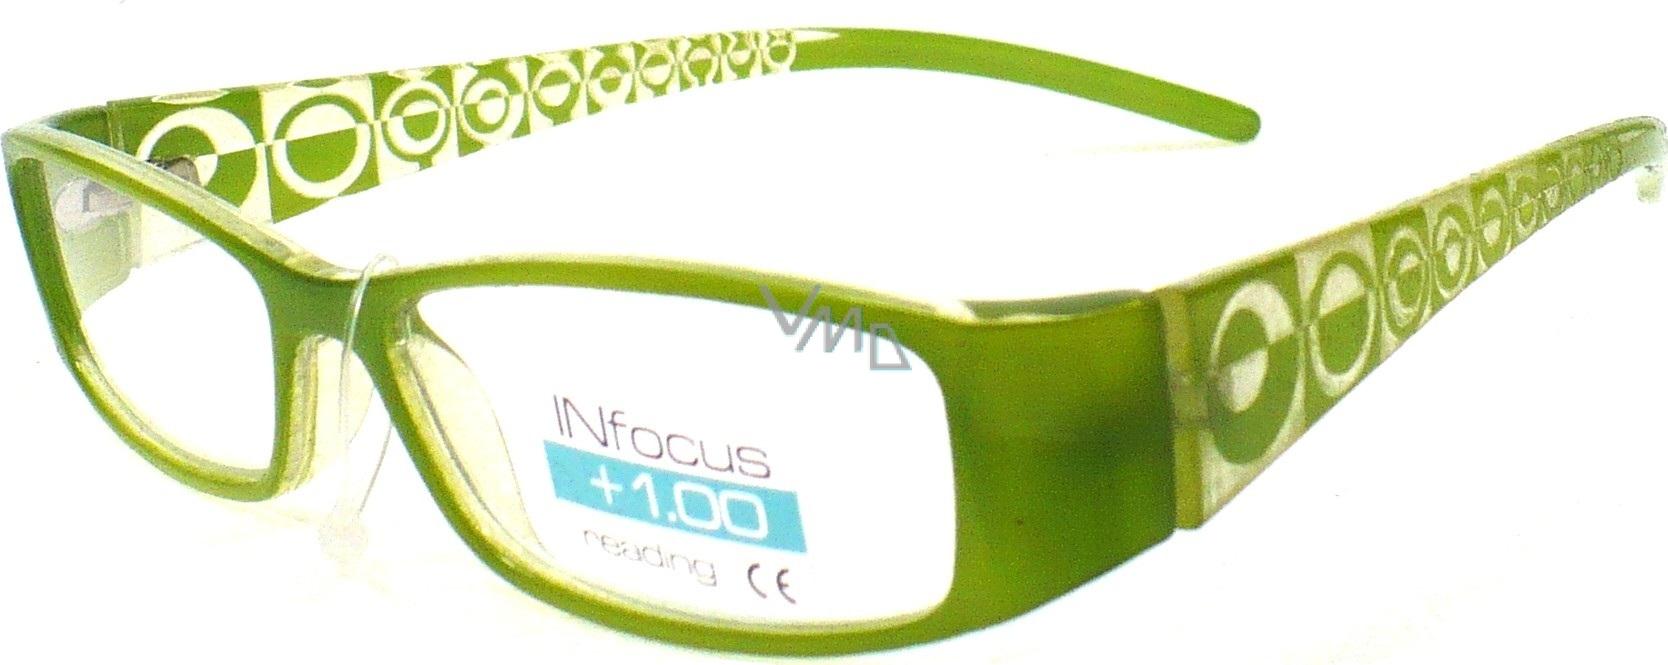 6b30c36f9 Berkeley Čtecí dioptrické brýle +1,50 zelené 1 kus R7603 PD62 - VMD ...